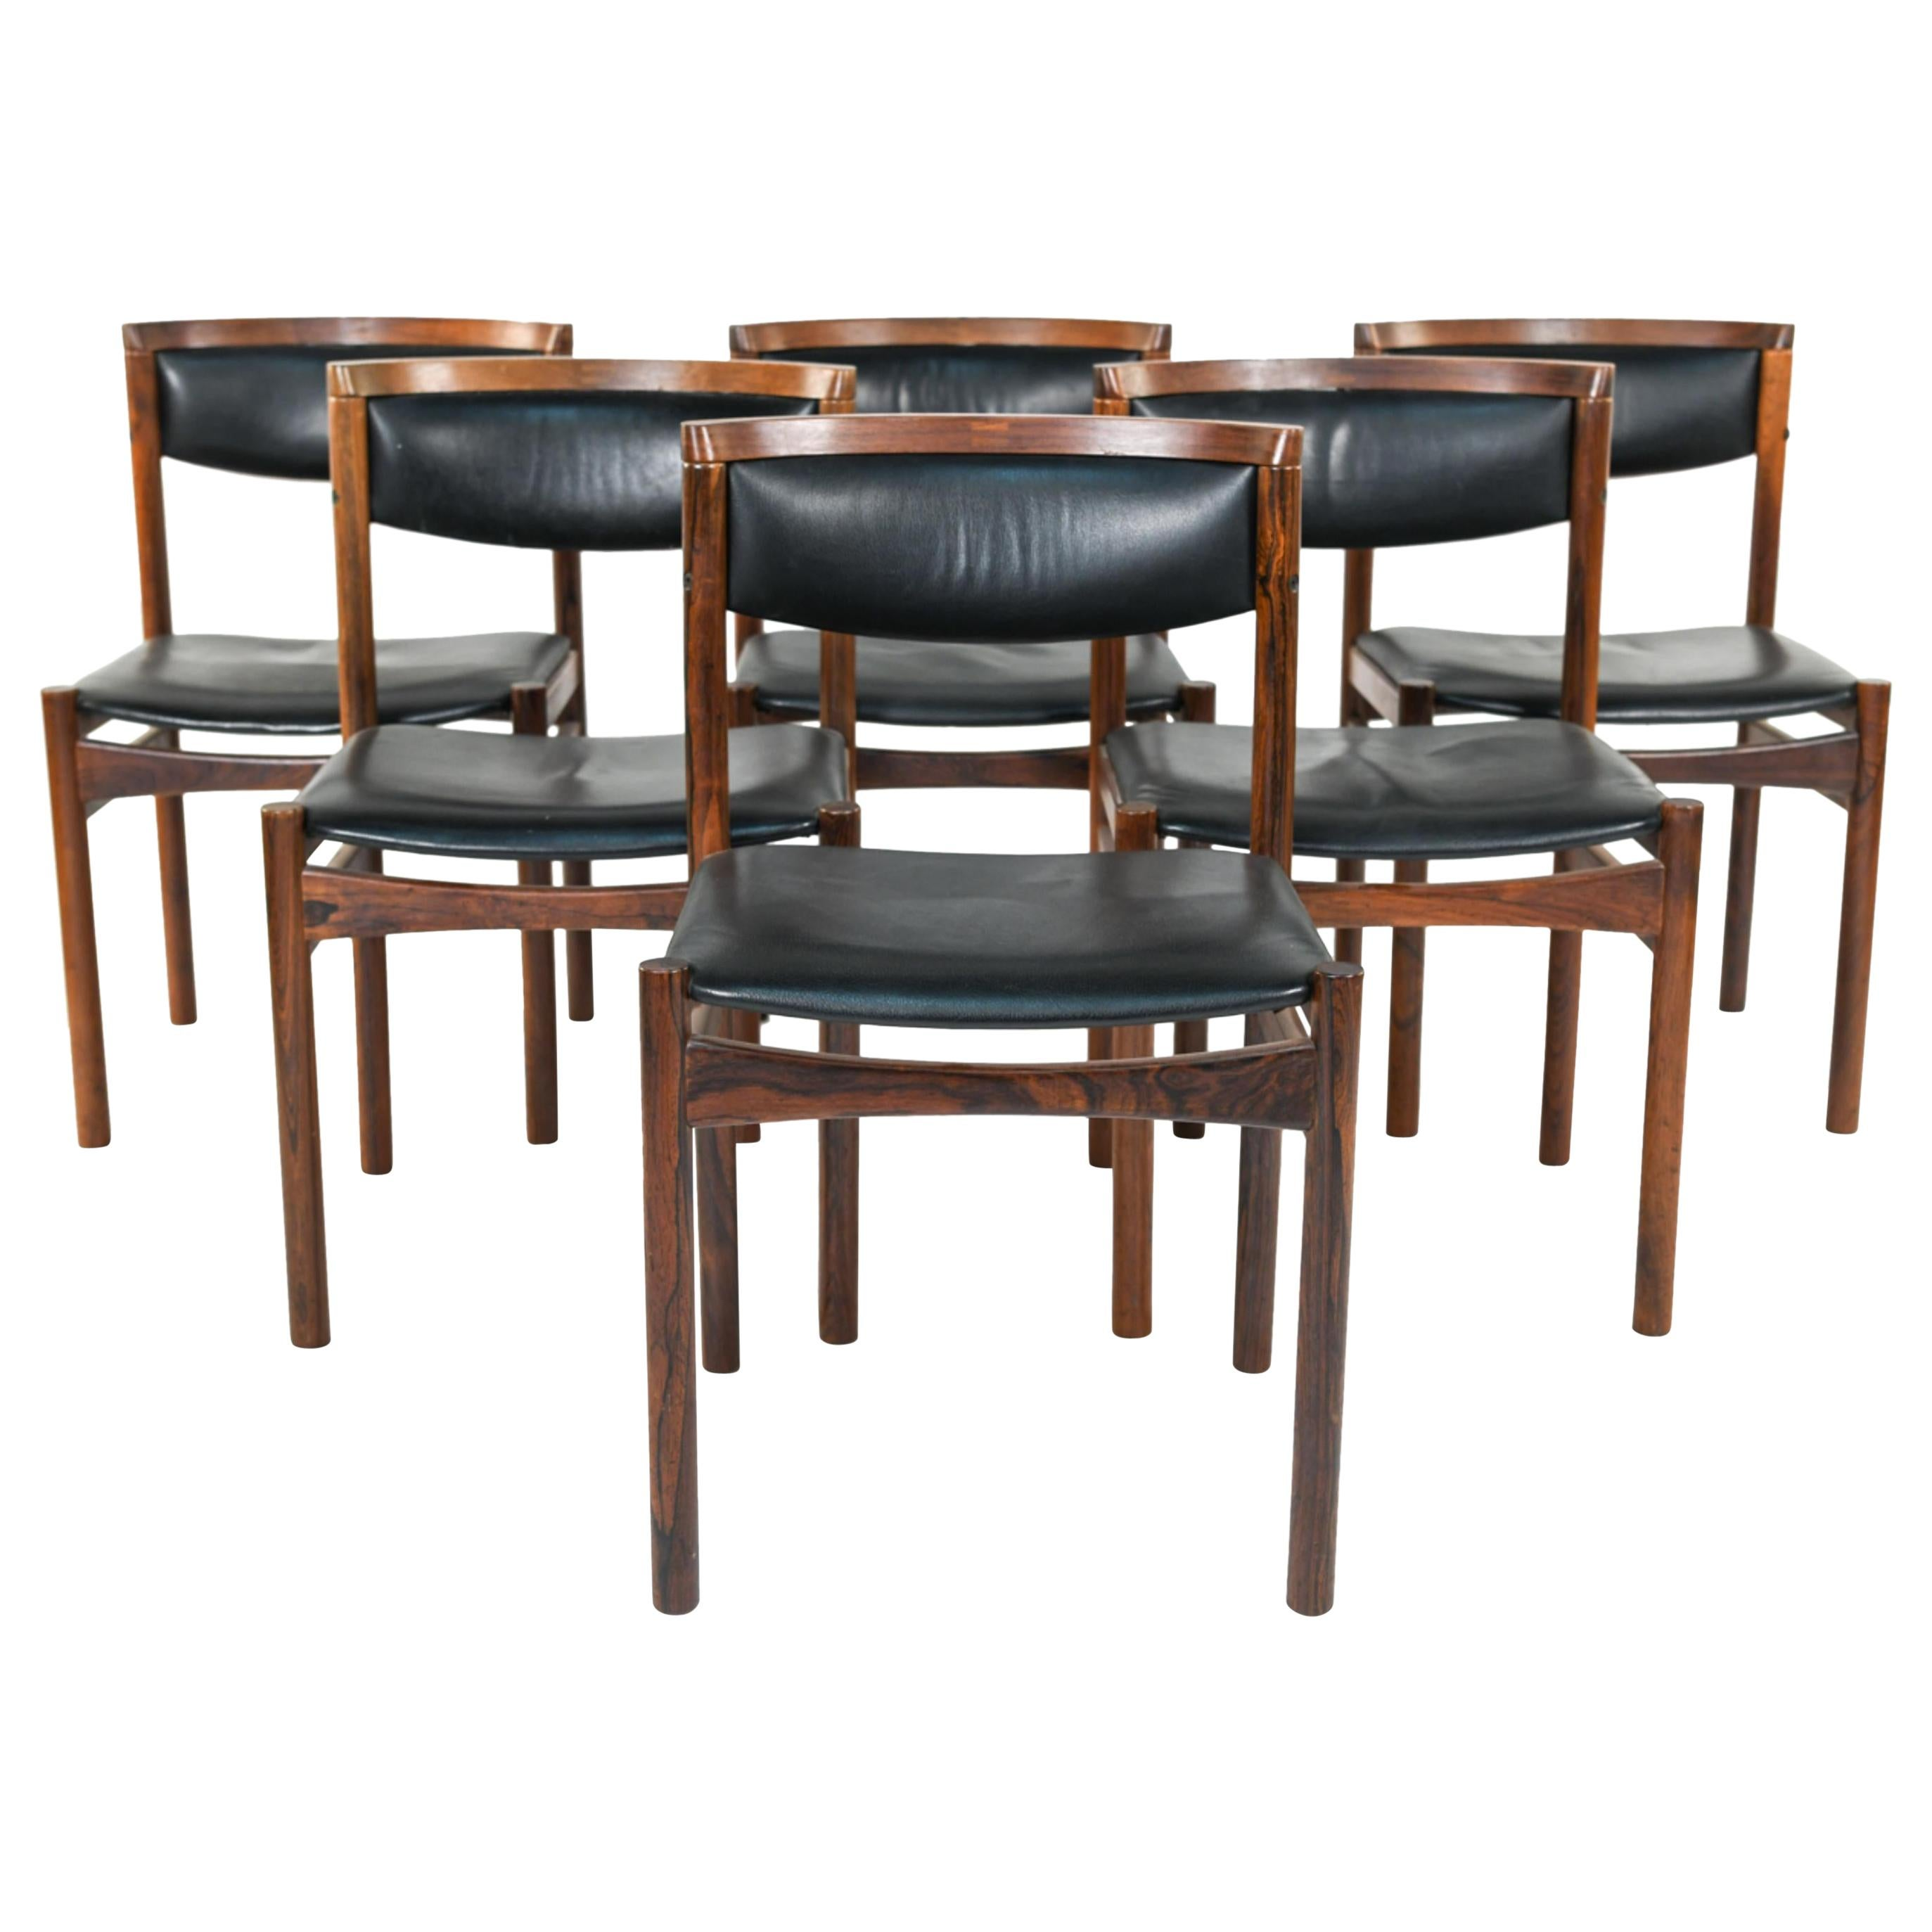 Six Mid-Century Modern Danish Dining Chairs, Soro Stolefabrik Denmark, Rosewood